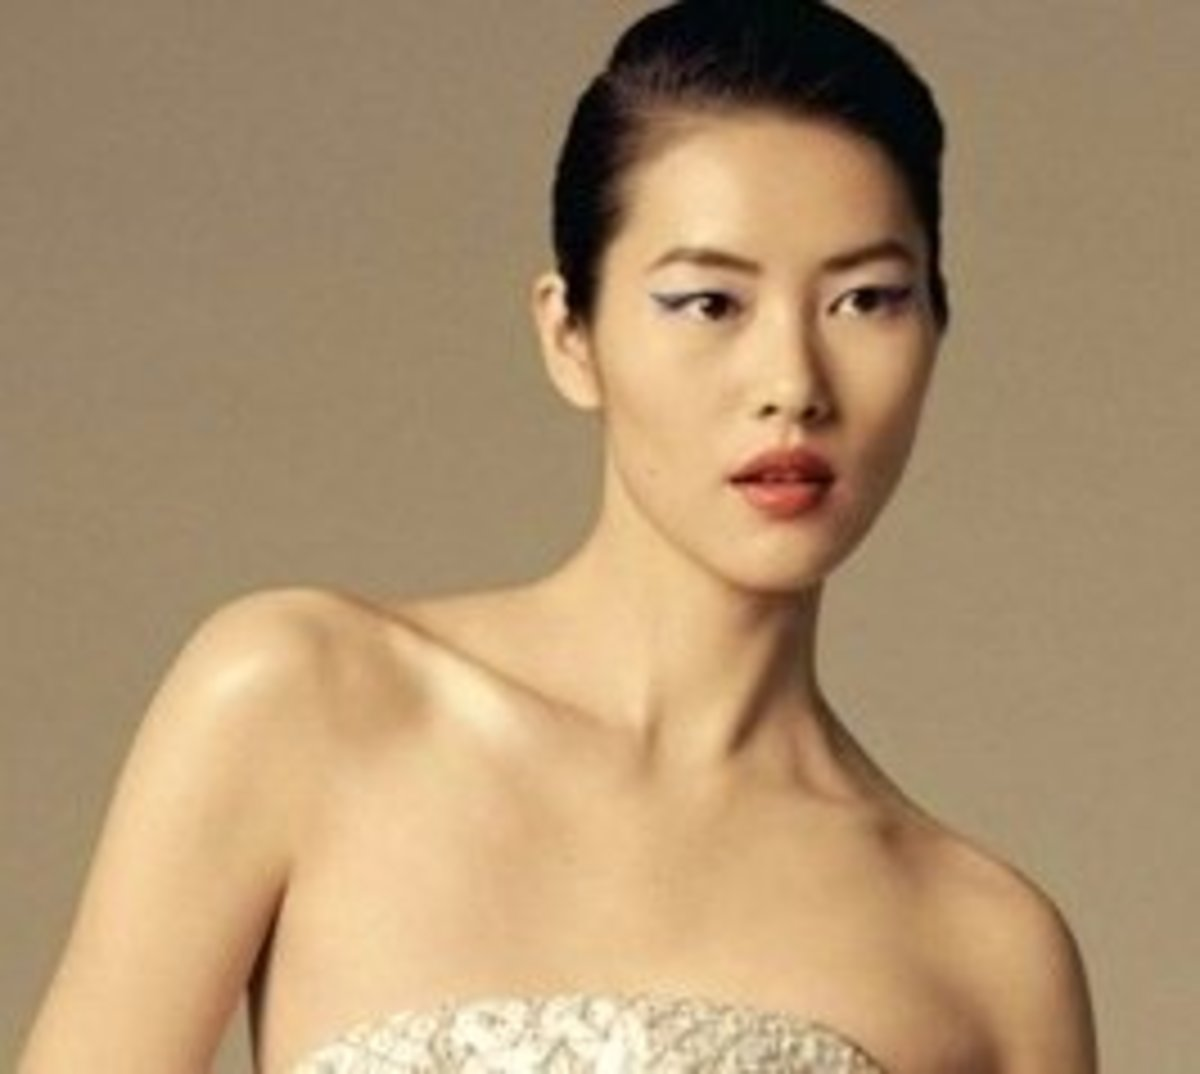 Slicked back short hair can still be feminine. The 10 Best Summer Hairstyles for Asian Women